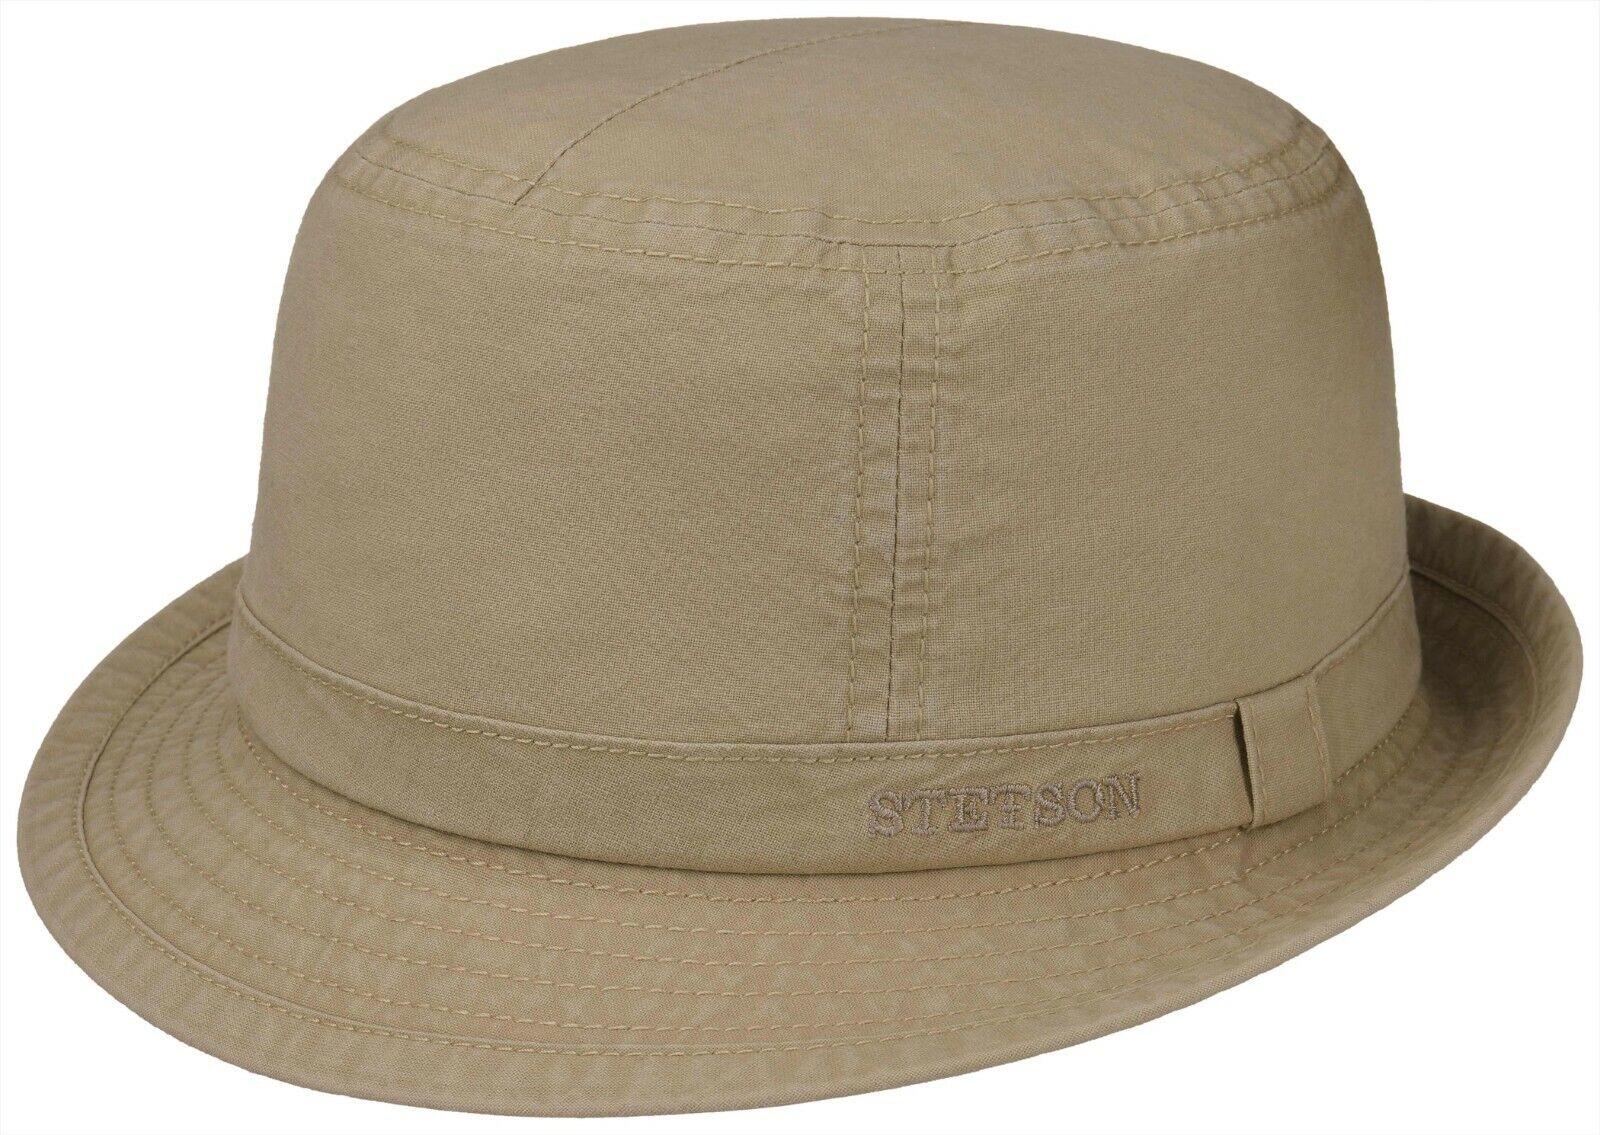 Stetson Sun Guard ® Summer Trilby Hat Hats Cotton Sun Hat Gander 76 Trend